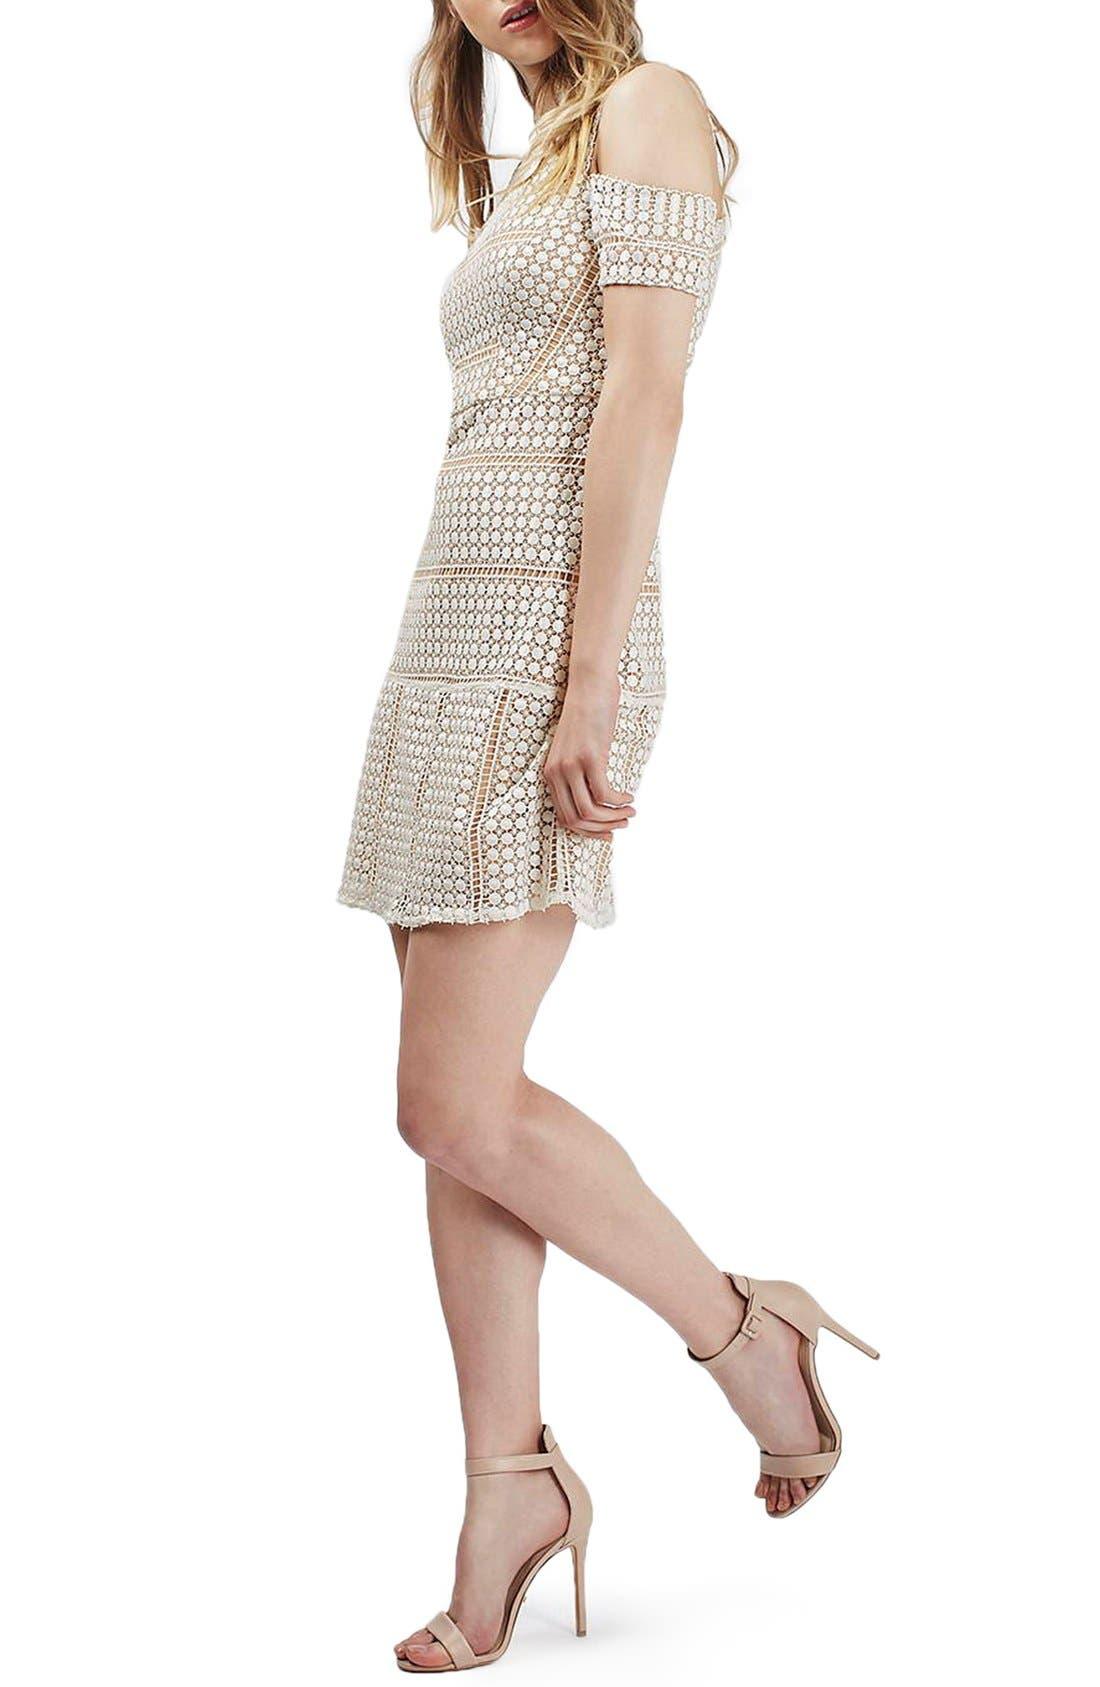 Alternate Image 1 Selected - Topshop Circle Lace Cold Shoulder Dress (Regular & Petite)